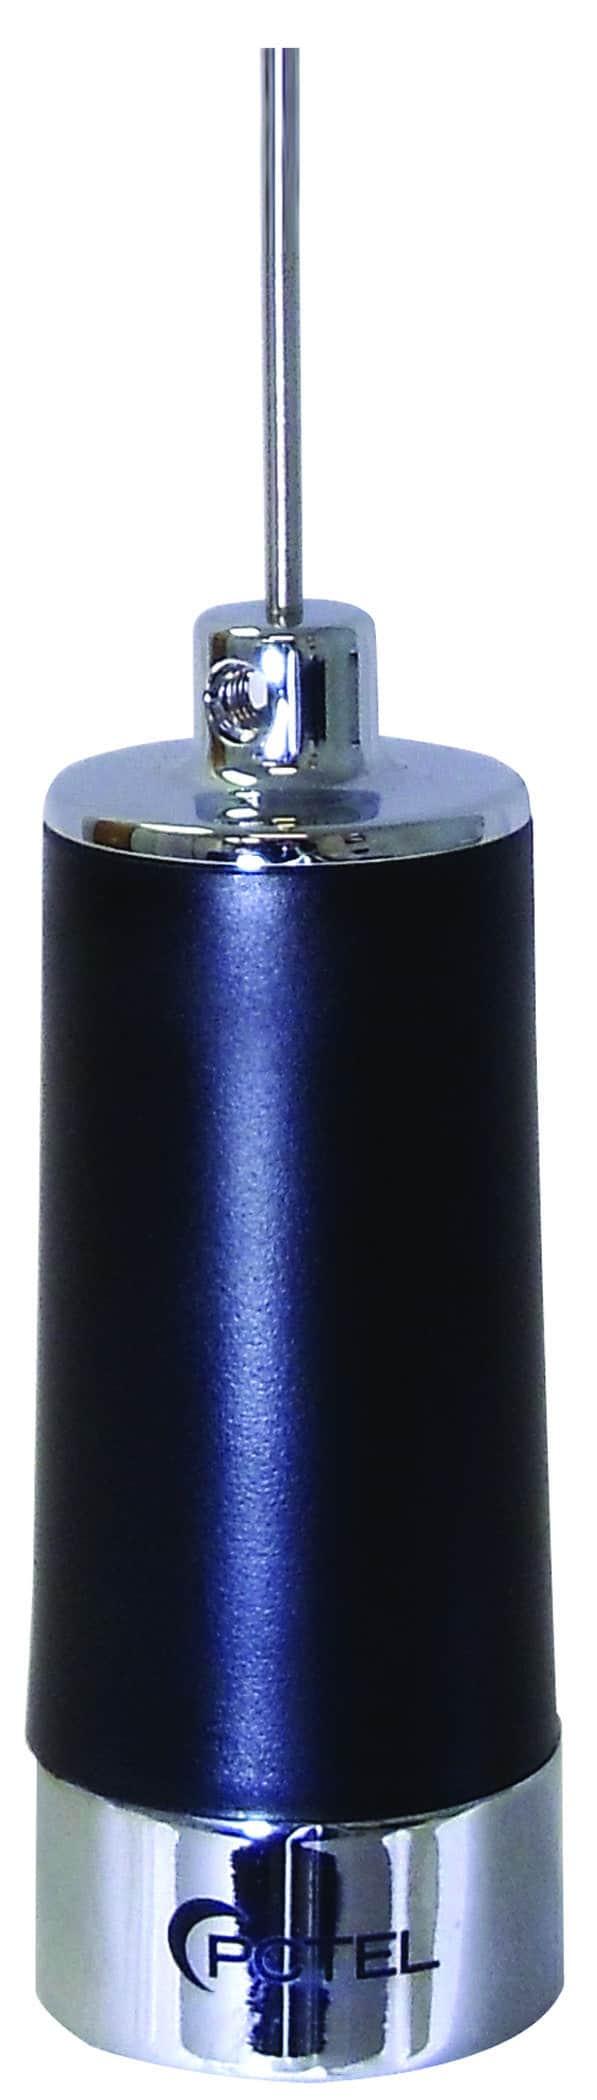 MLB3400 - Maxrad 34-40 MHz Low Band 200 Watt Unity Gain Antenna (Coil & Rod)